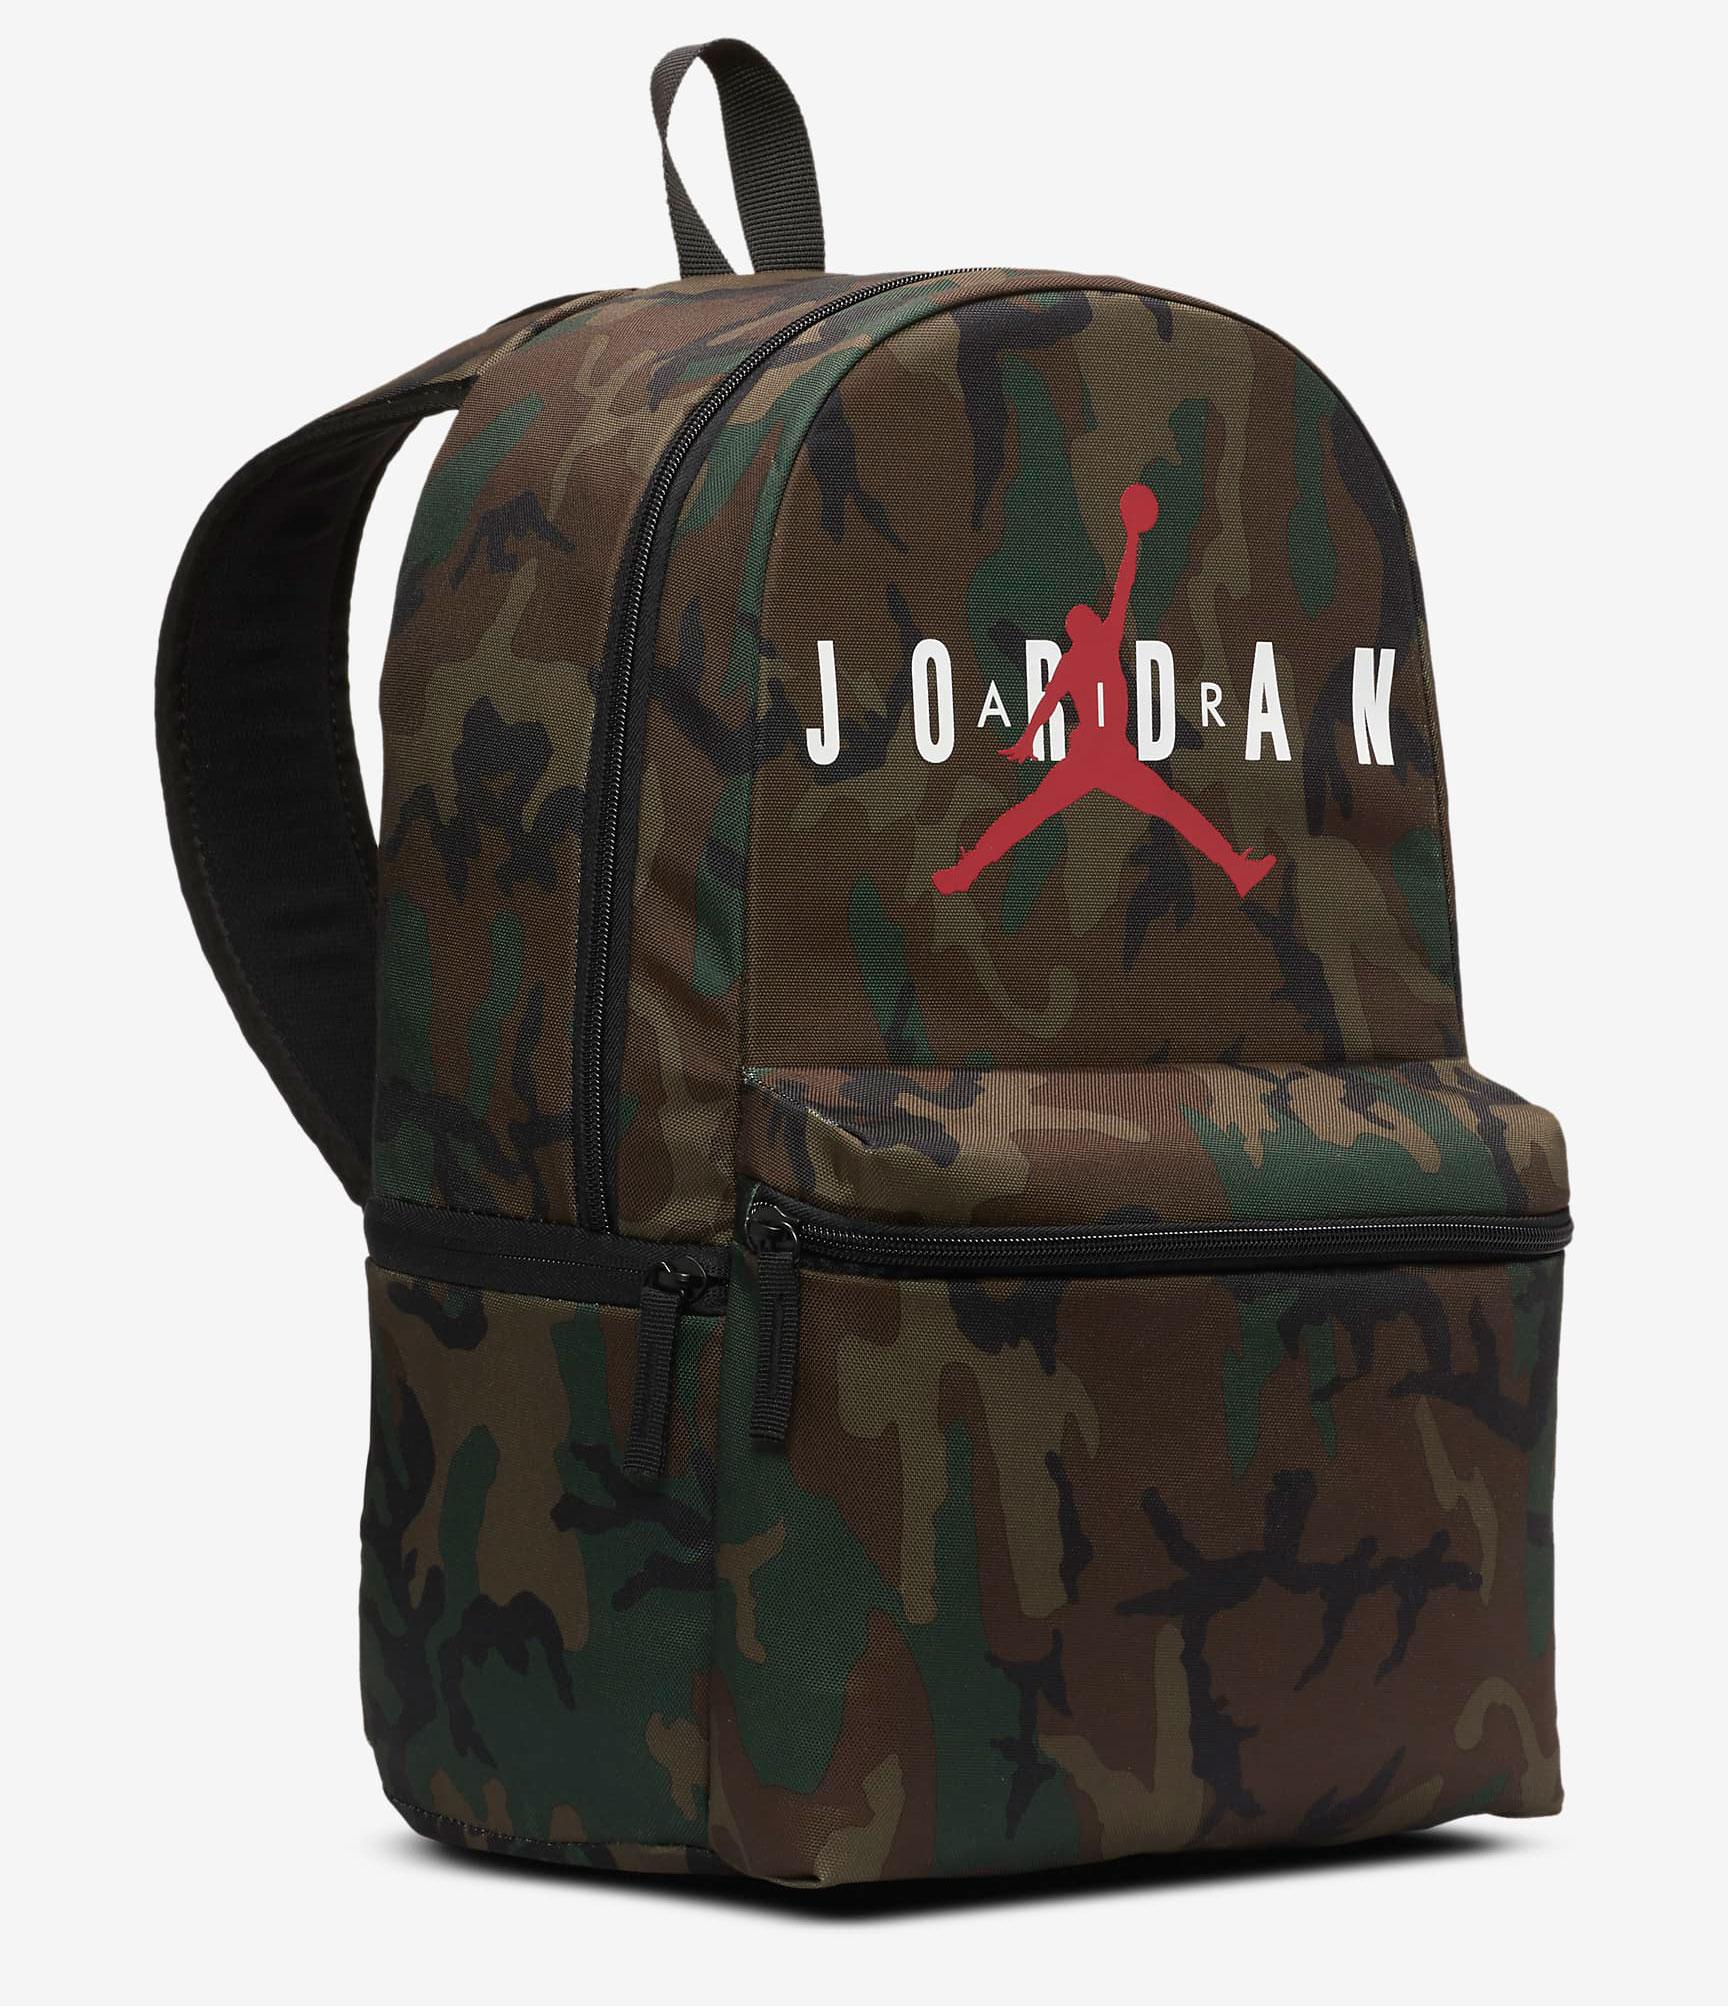 air-jordan-1-dark-mocha-backpack-match